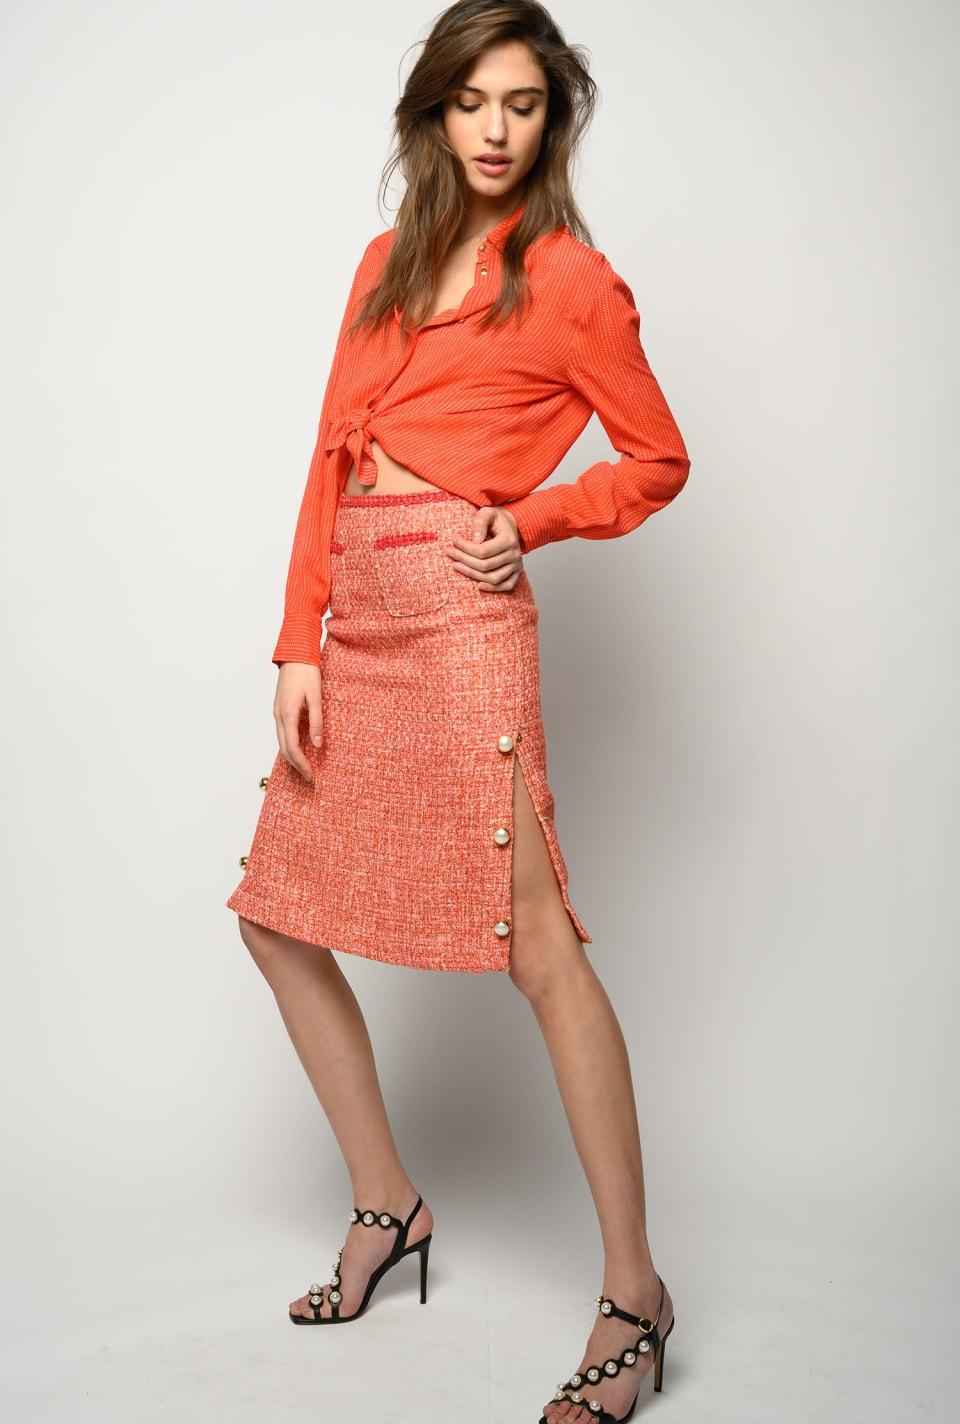 Lurex tweed midi skirt - Pinko